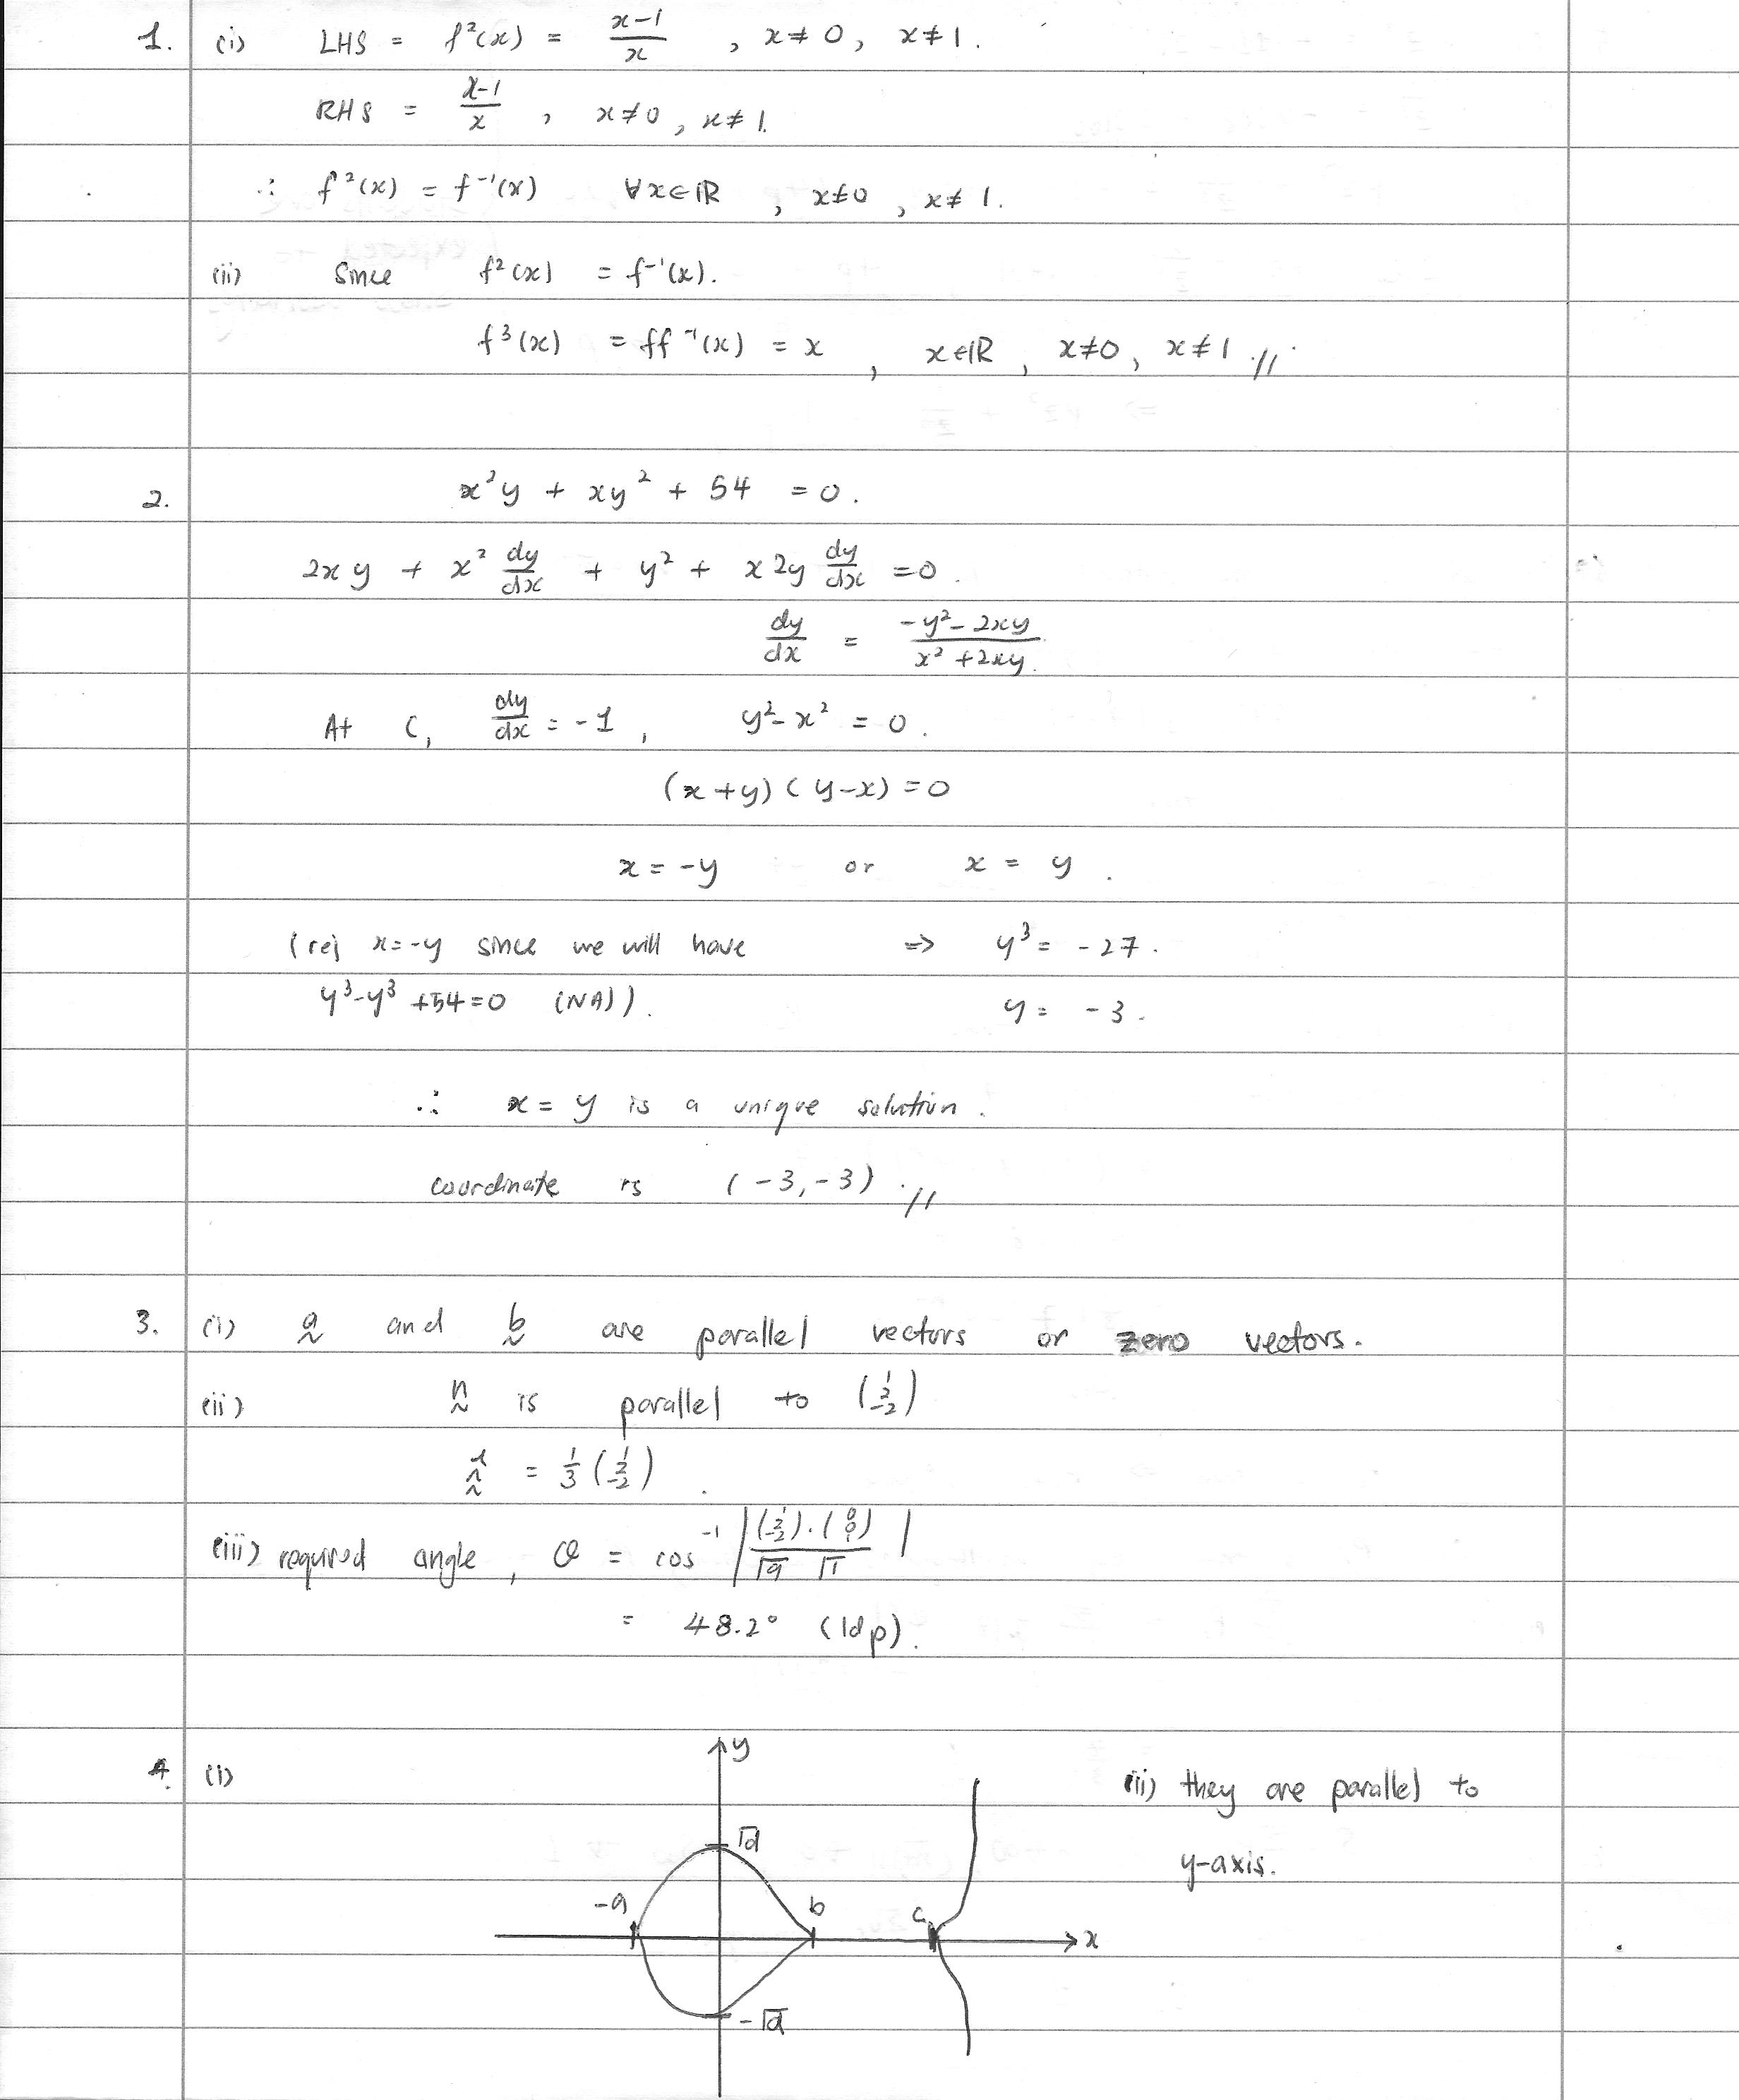 mathematics grade 12 exam papers 2009